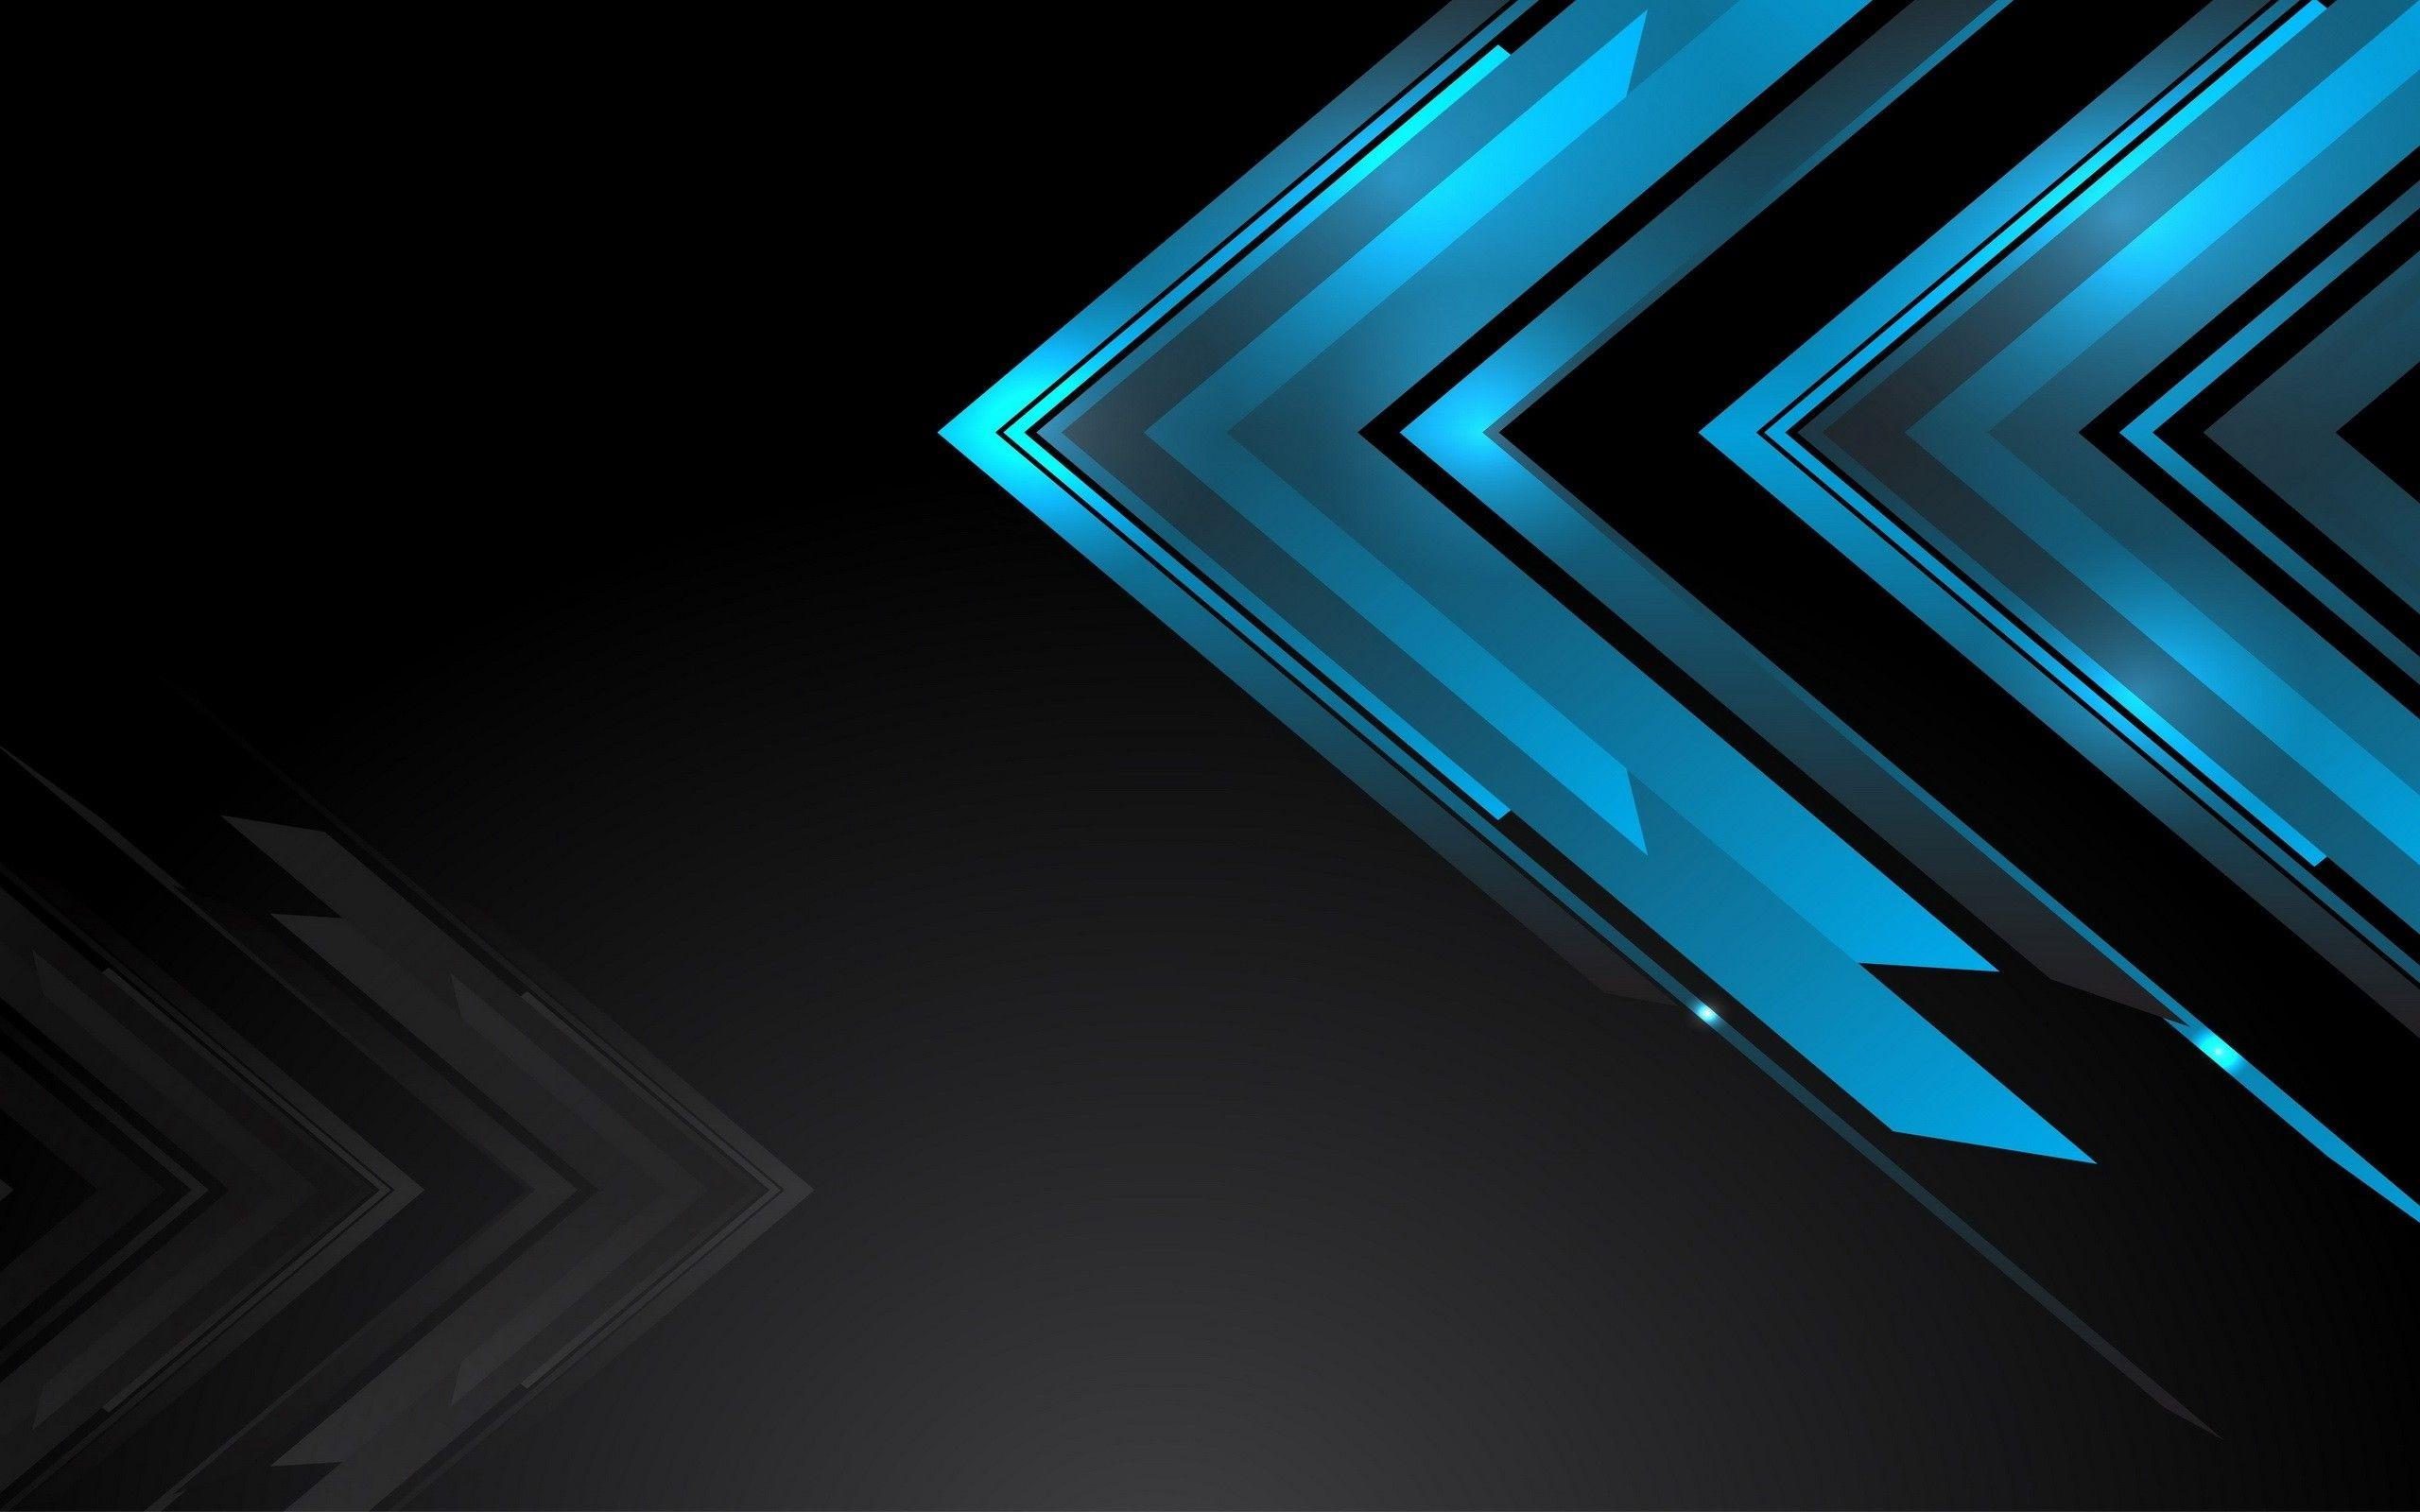 Res 2560x1600 Black Wallpaper Hd 1920x1200 Black And Blue Tech Wallpaper Black Wallpaper Black And Blue Background Wallpaper